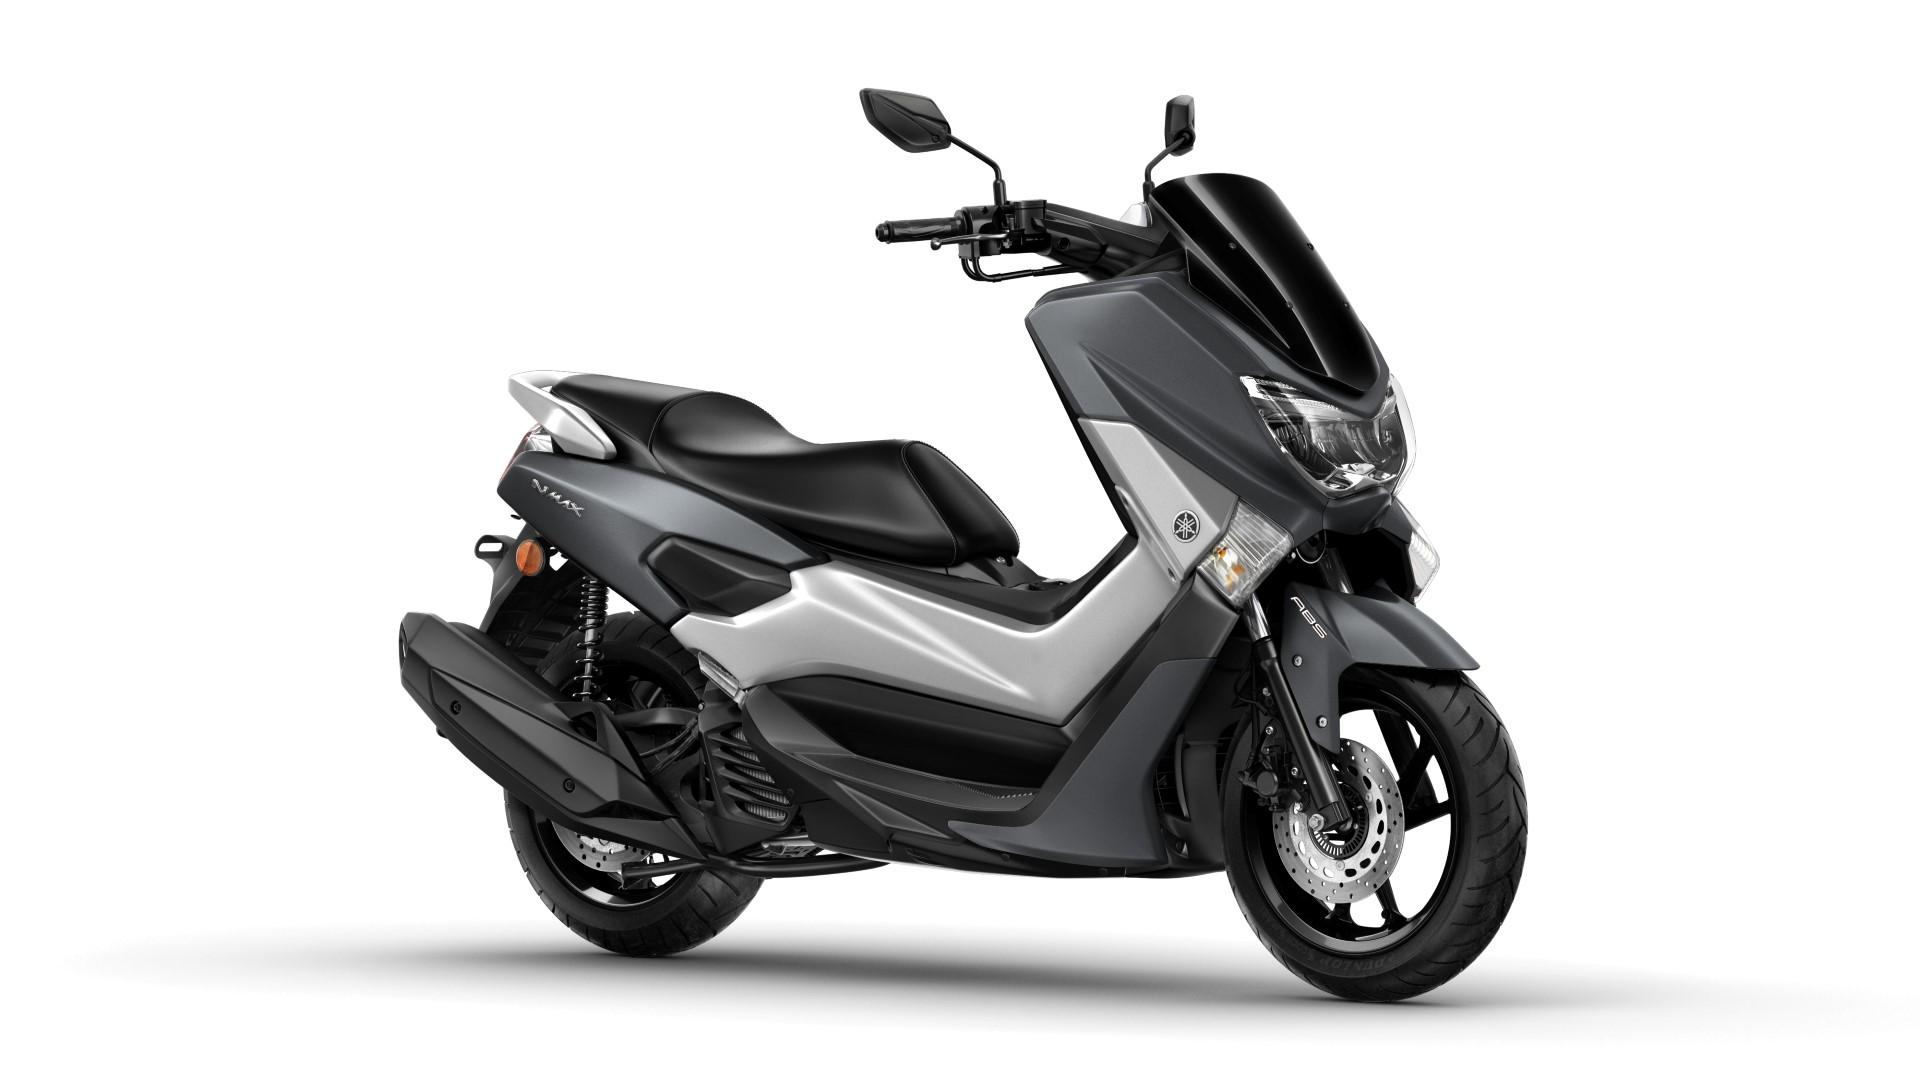 Yamaha NMAX 155 2017